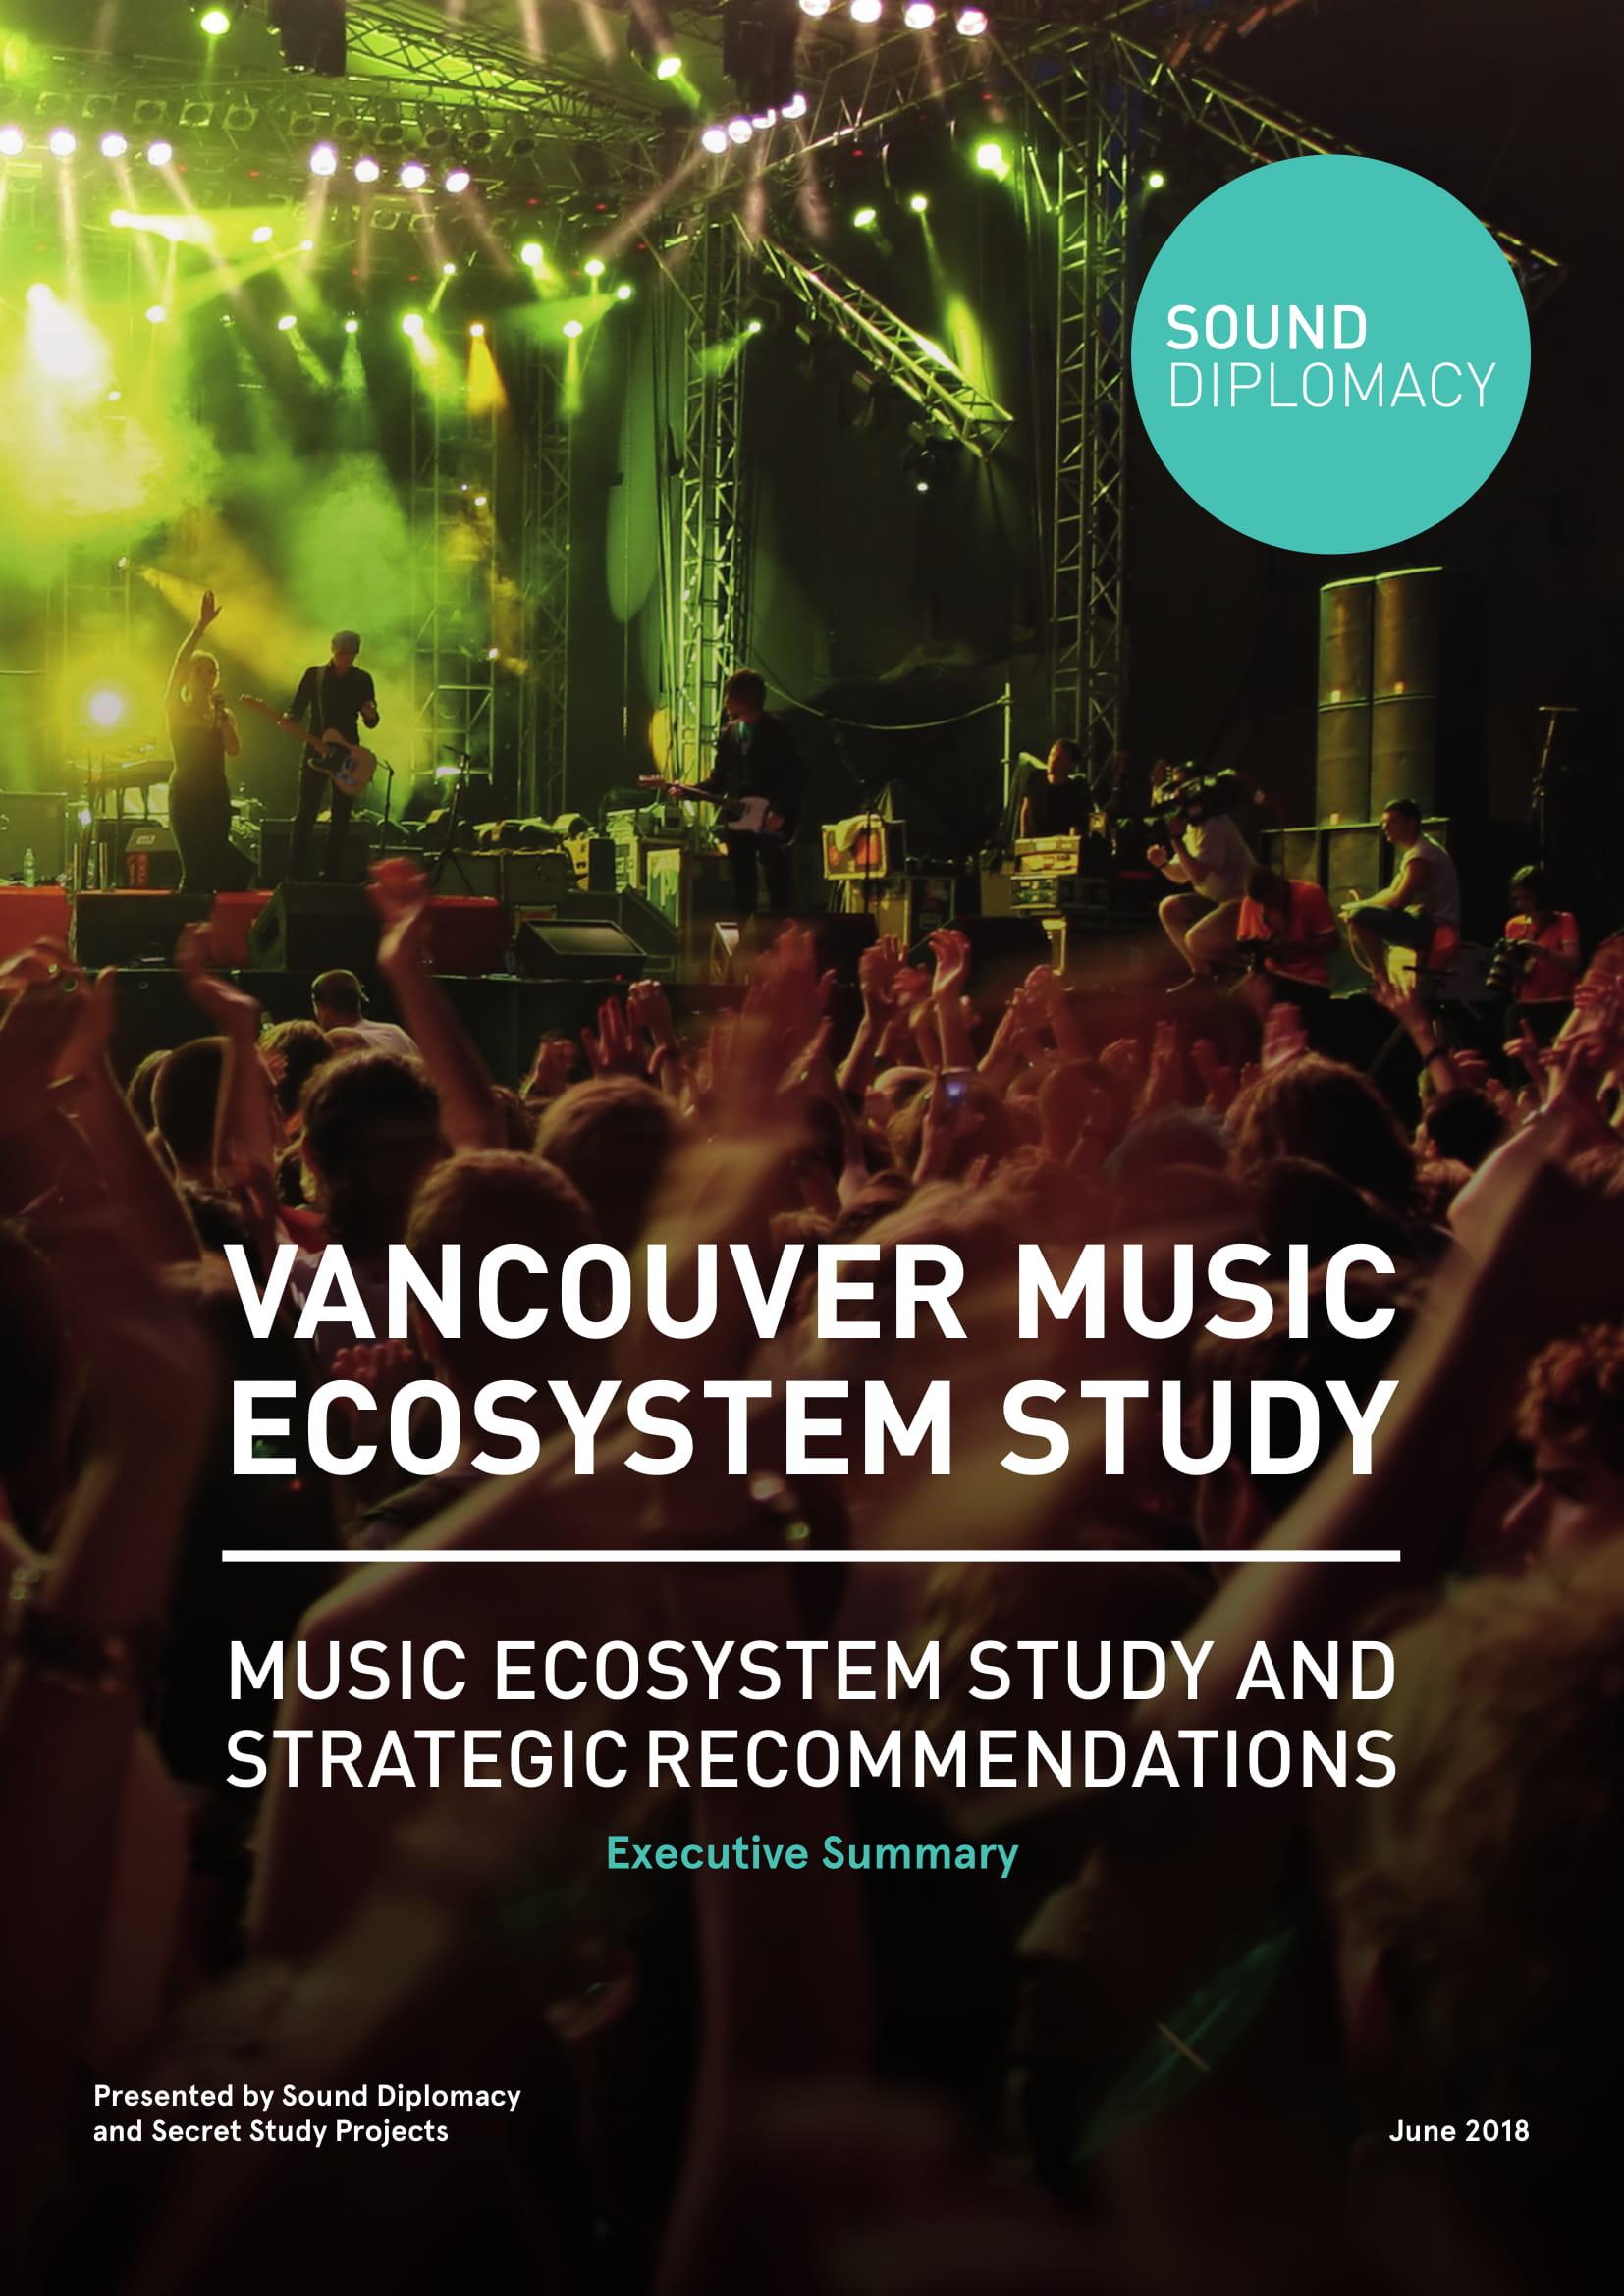 714+SOUND+DIPLOMACY+A4+Vancouver+Executive+Summary_V8_DIGITAL-01.jpg